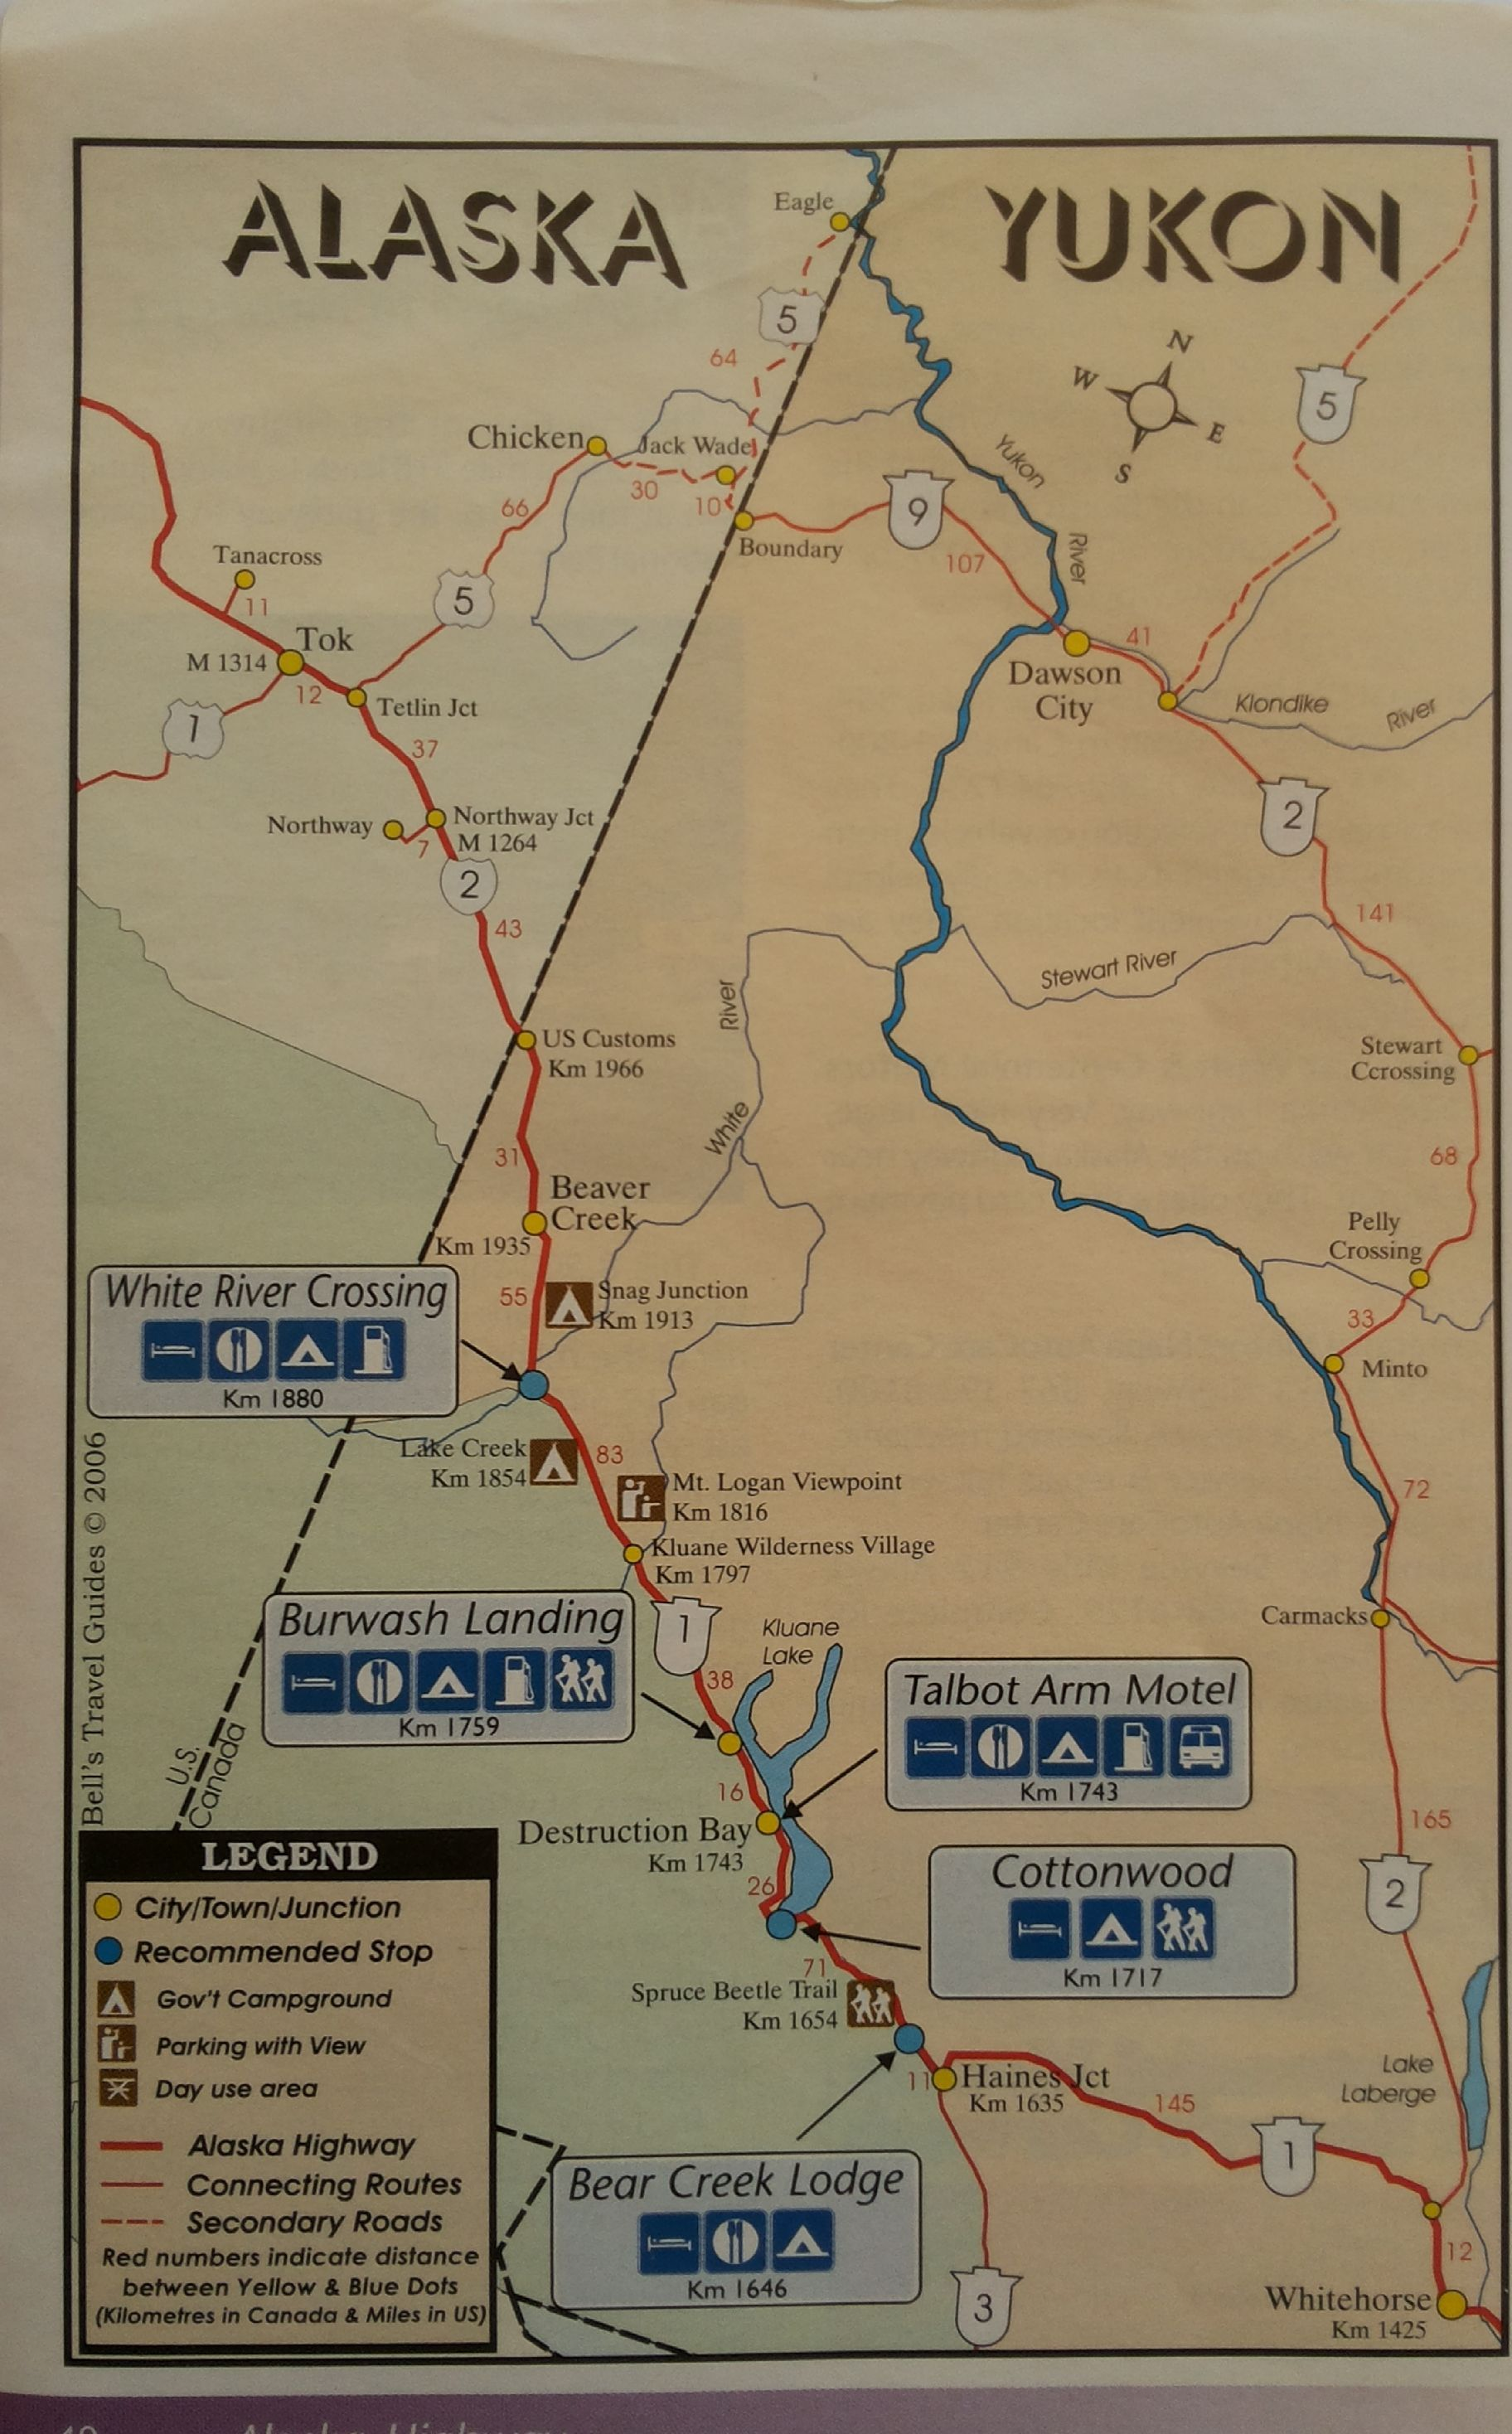 Alaska Yukon mapDrive from Whitehorse to Inuvik NW Territories